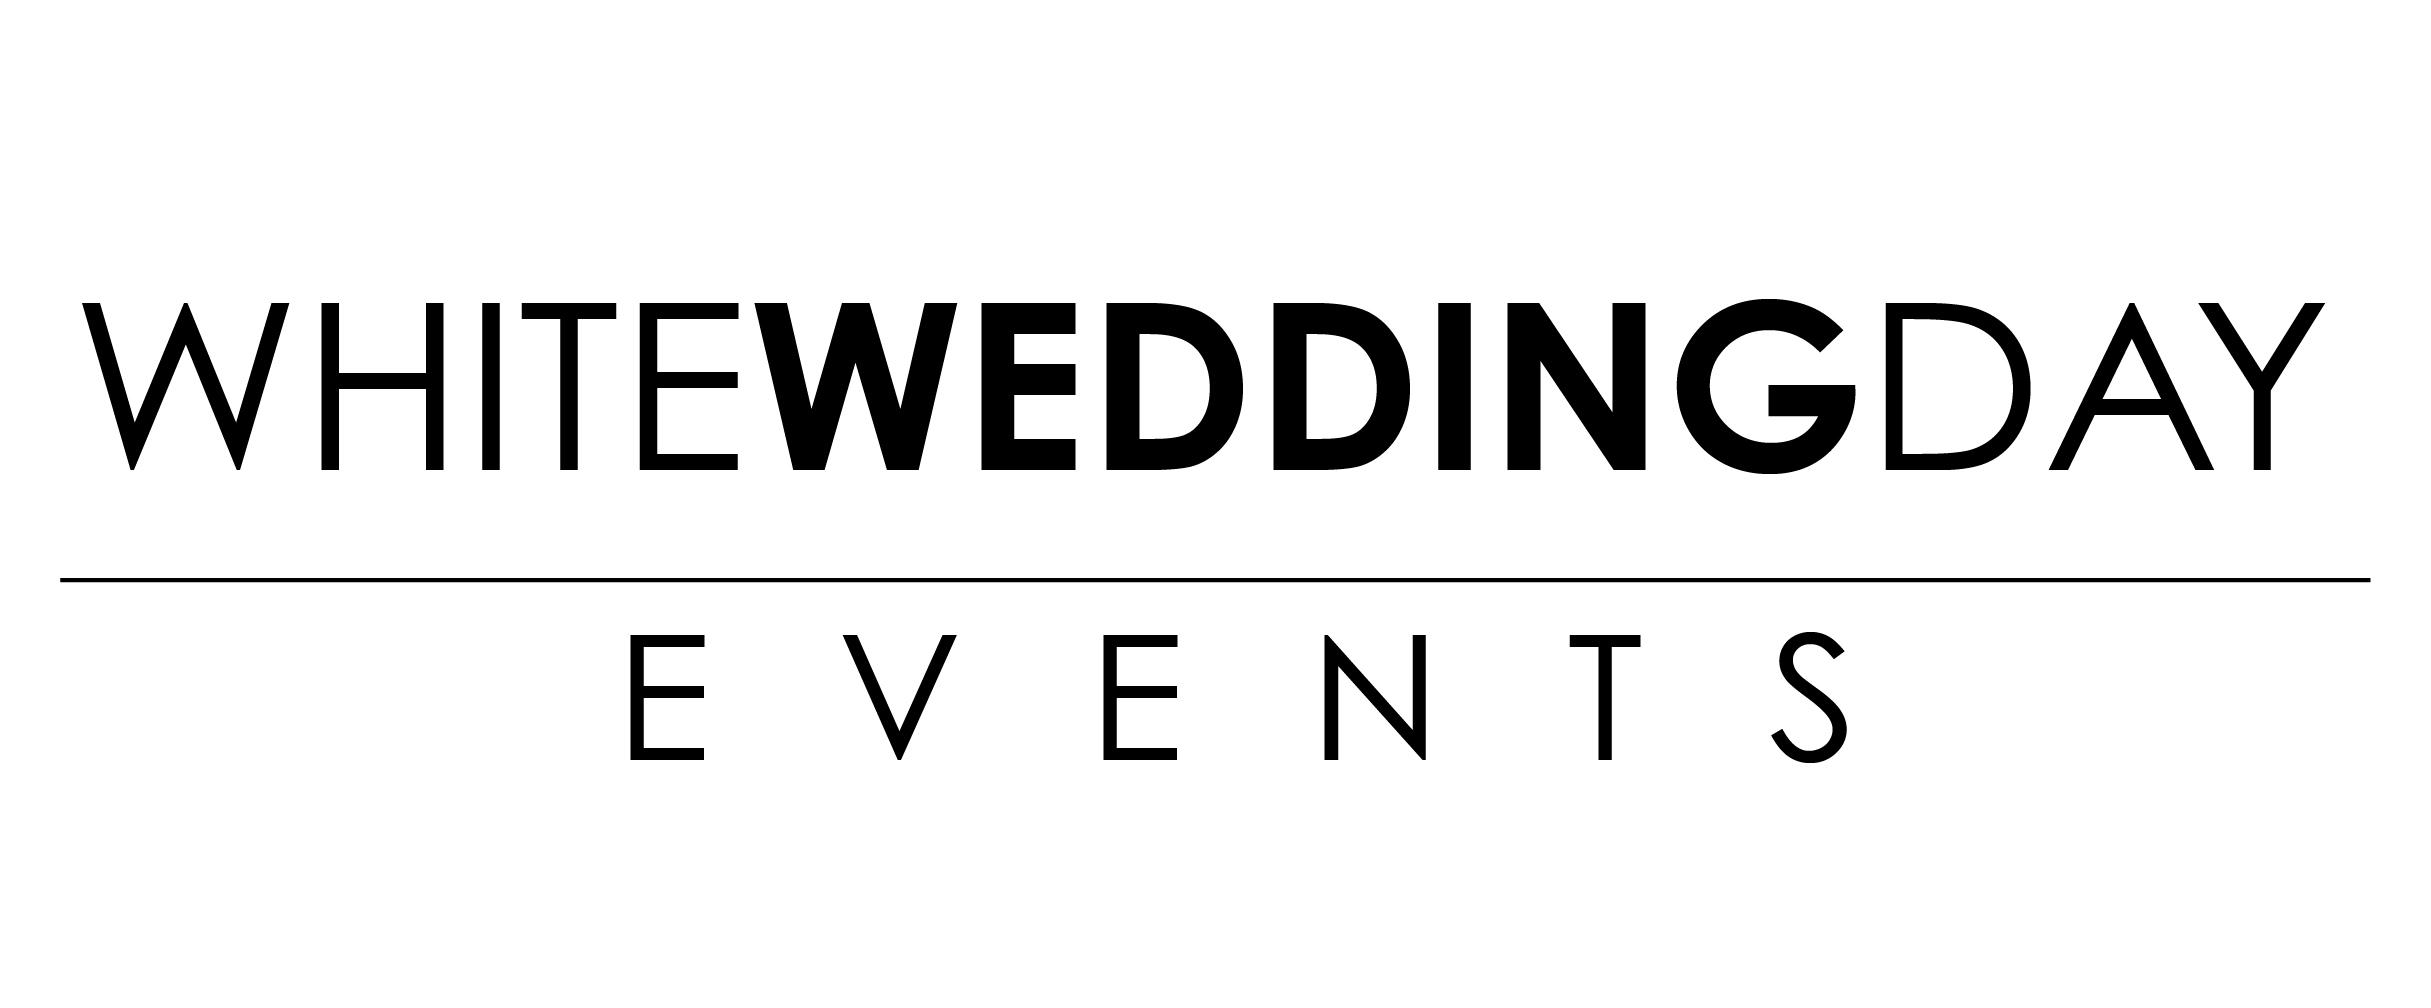 White Wedding Day_black-01-01.jpg